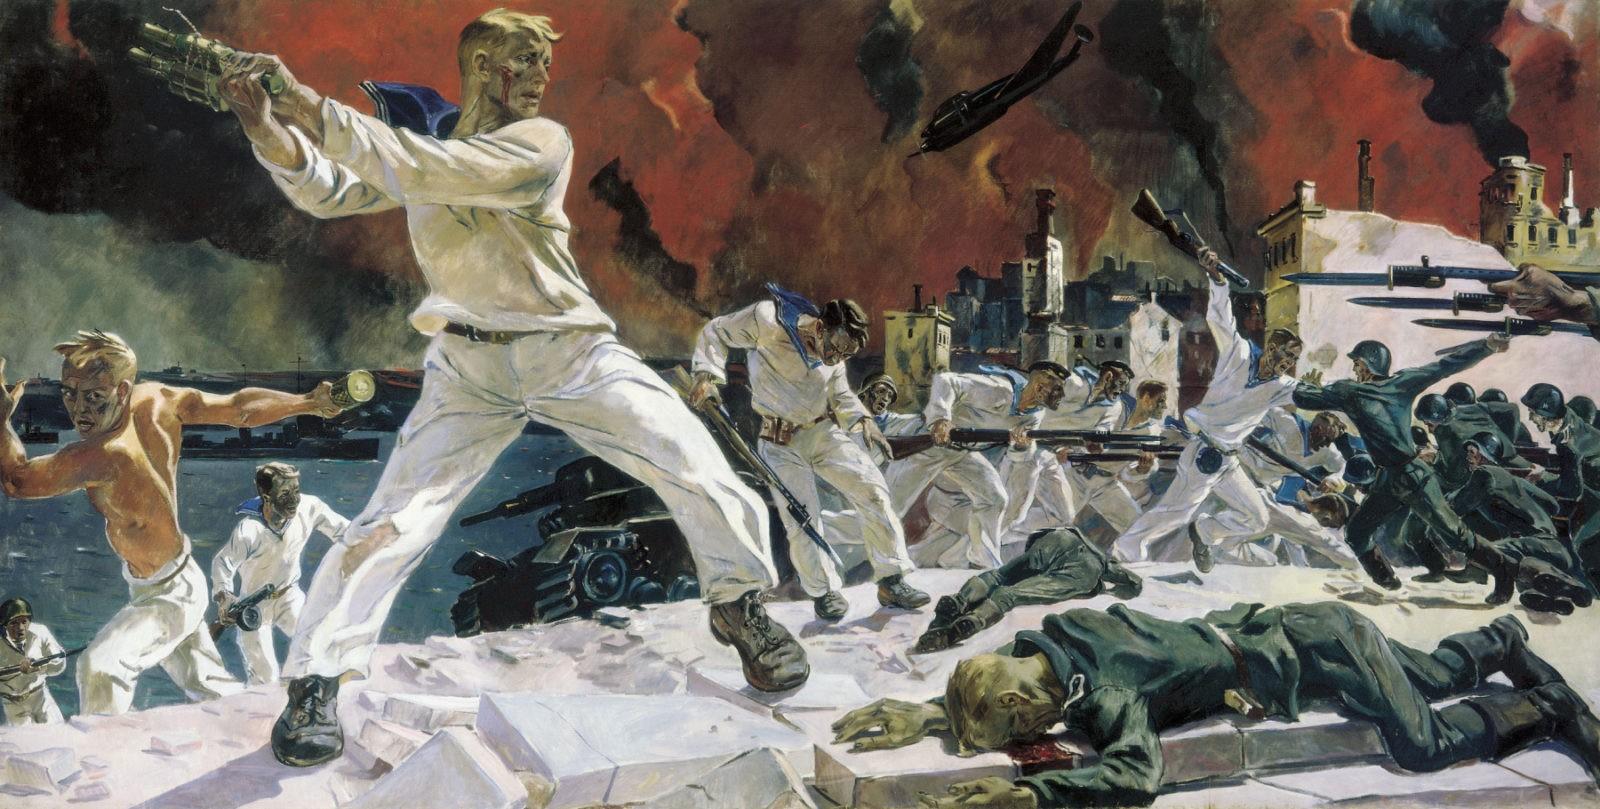 Социалистический реализм художника Александра Дейнека